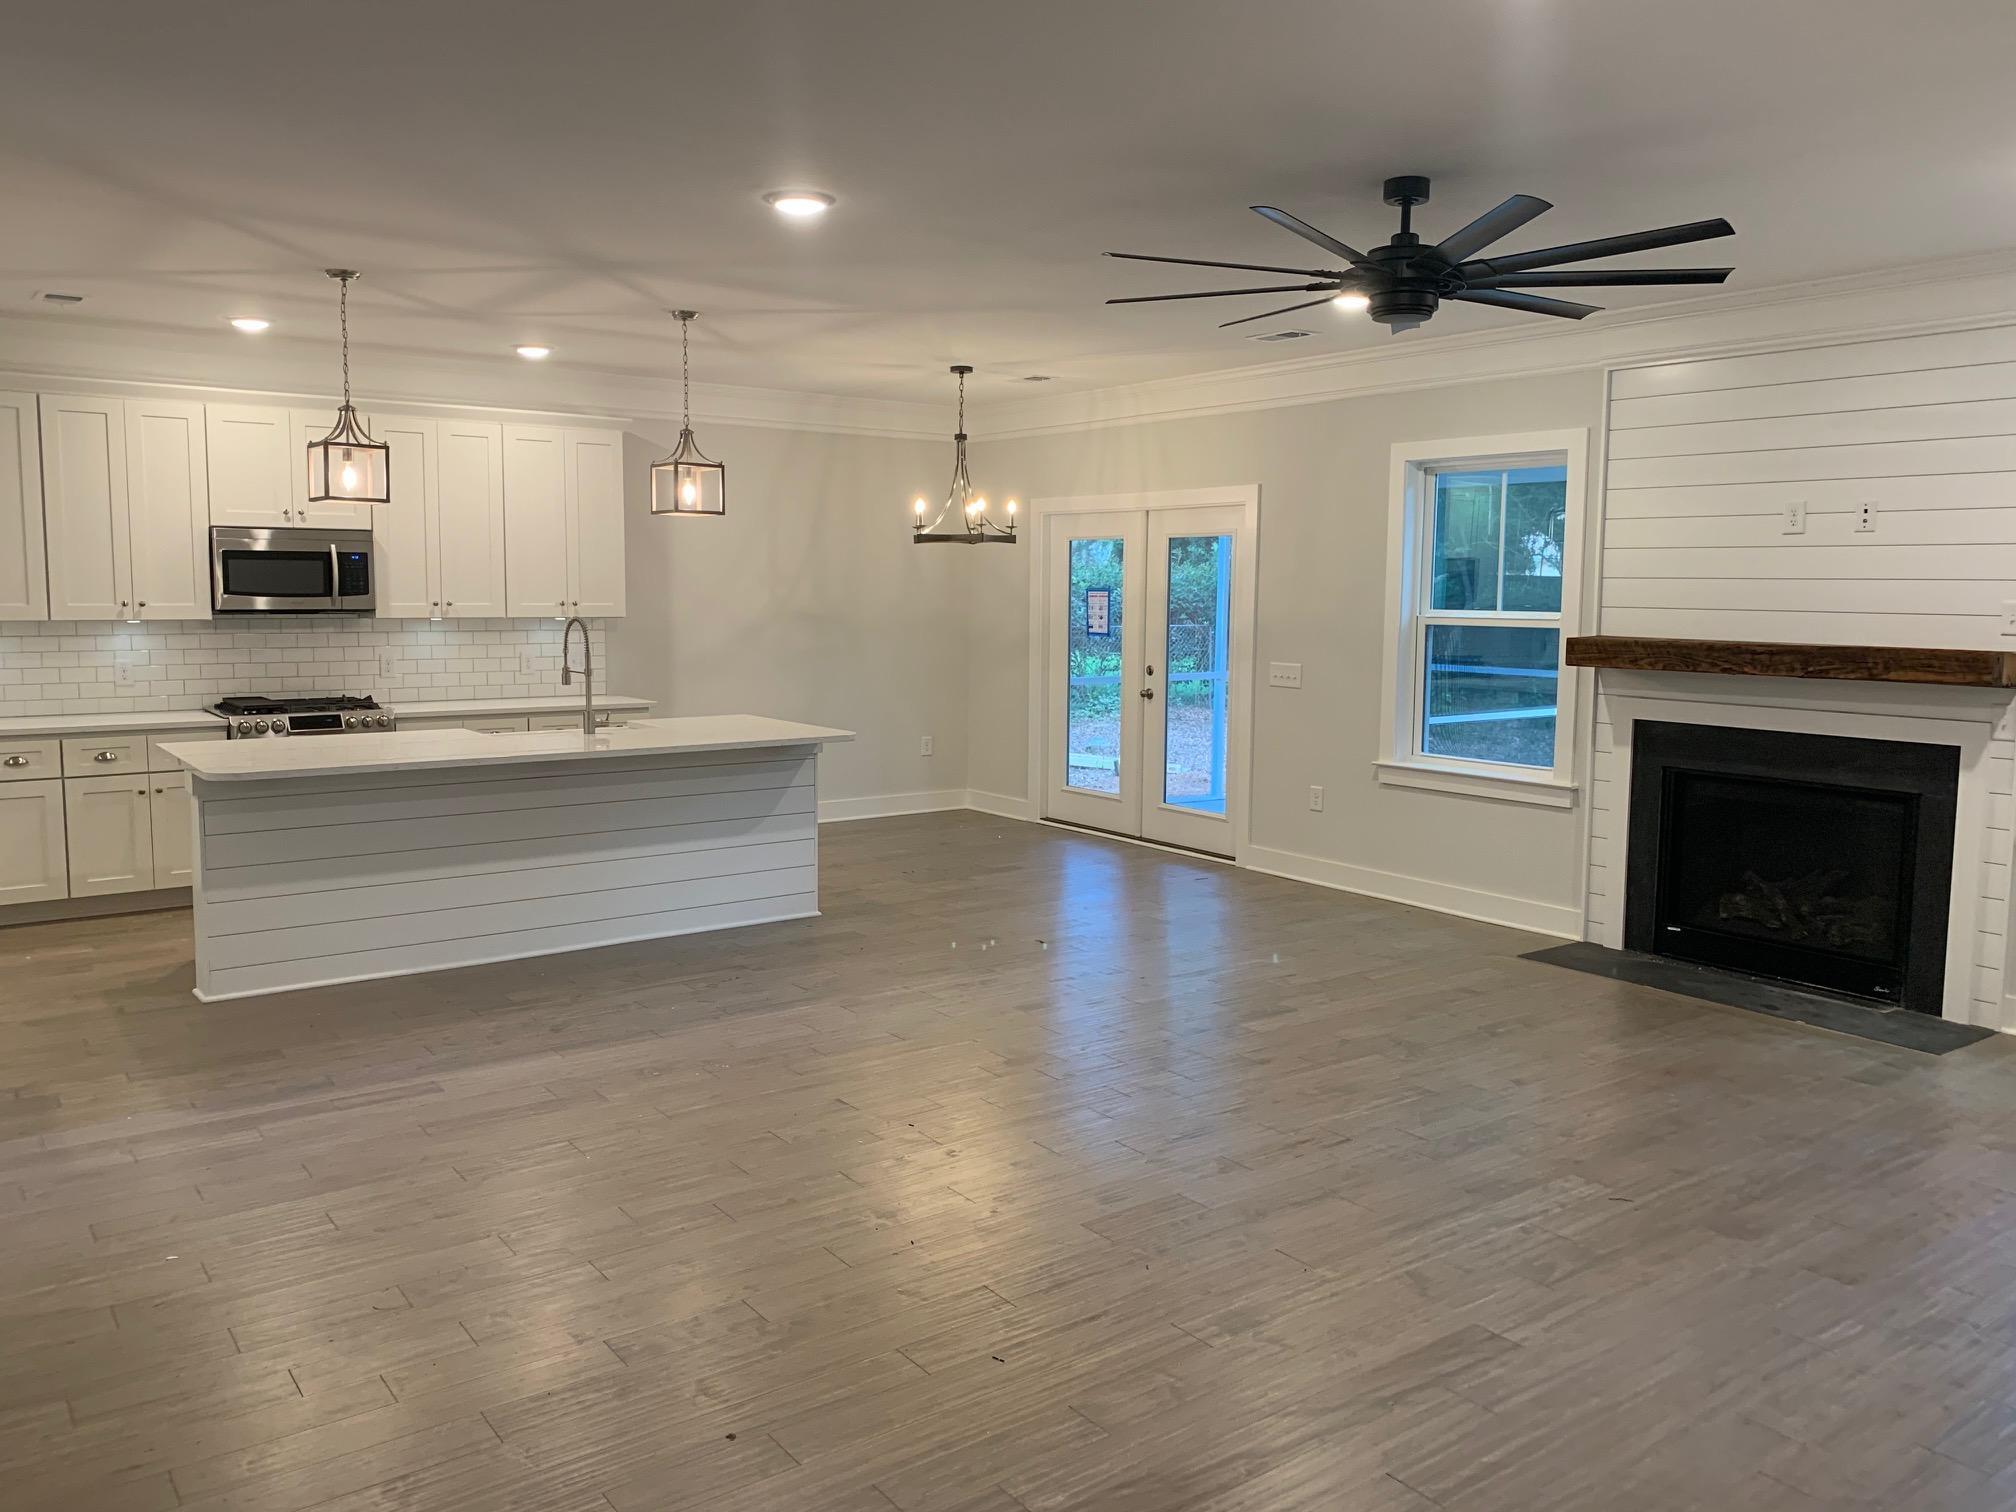 Scanlonville Homes For Sale - 217 7th, Mount Pleasant, SC - 11